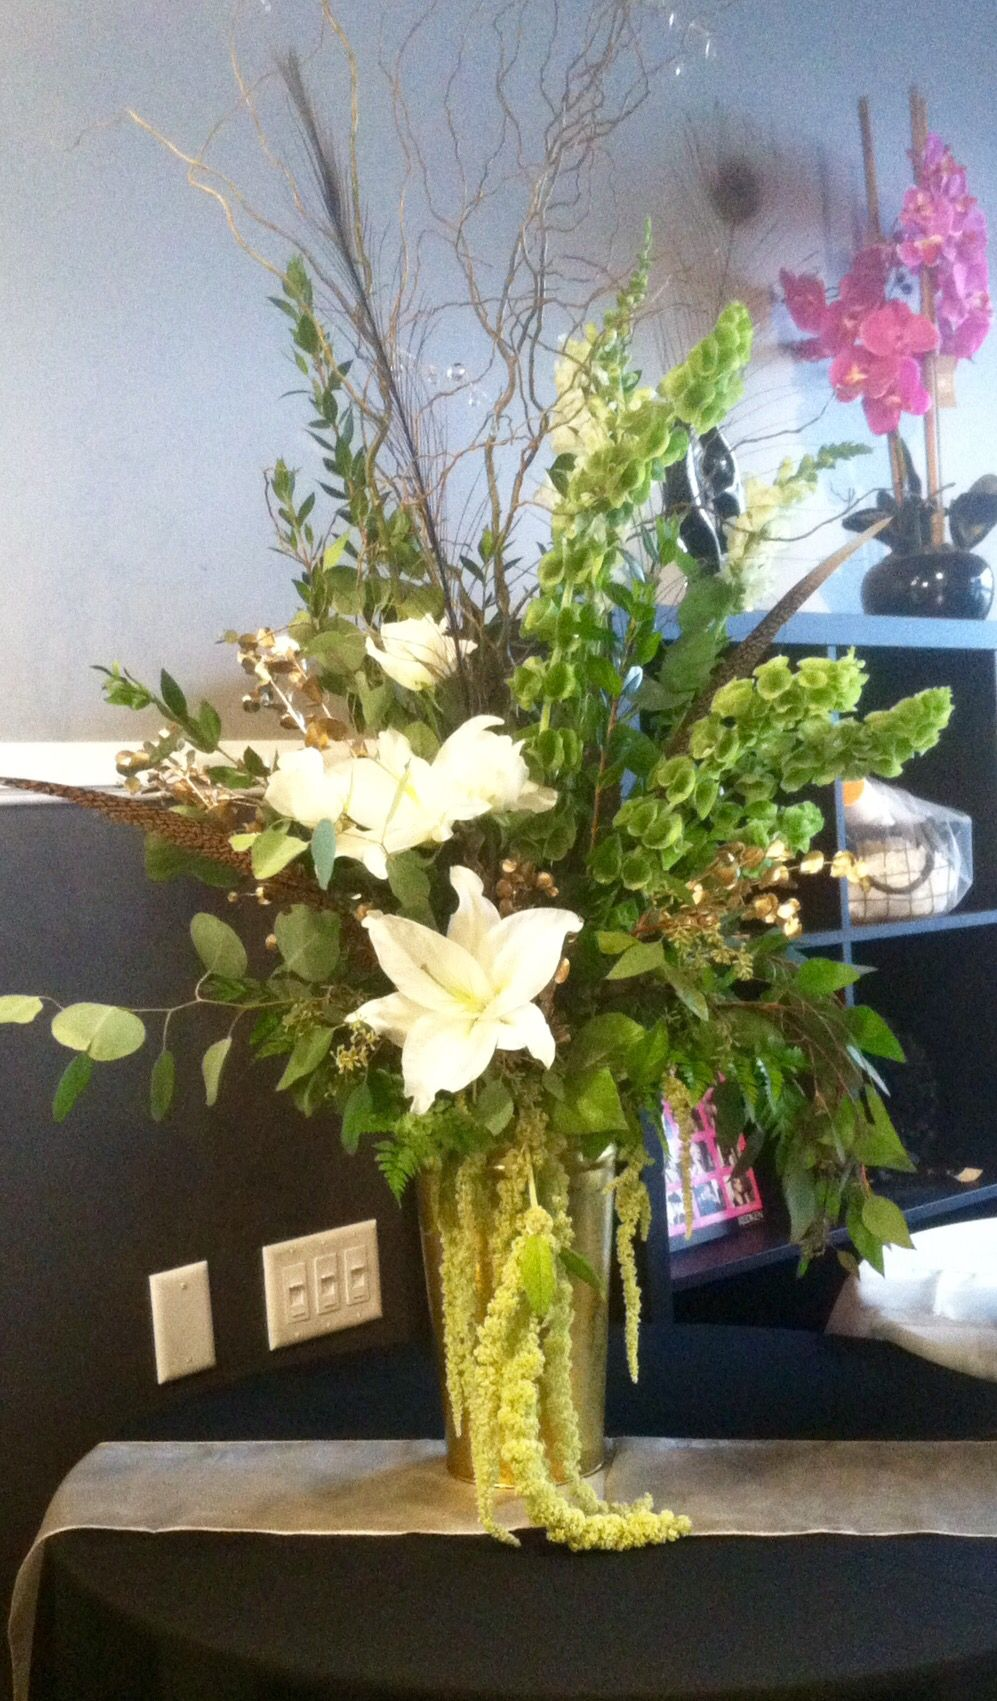 Hanging Amaranthus white stargazer lilies white roses